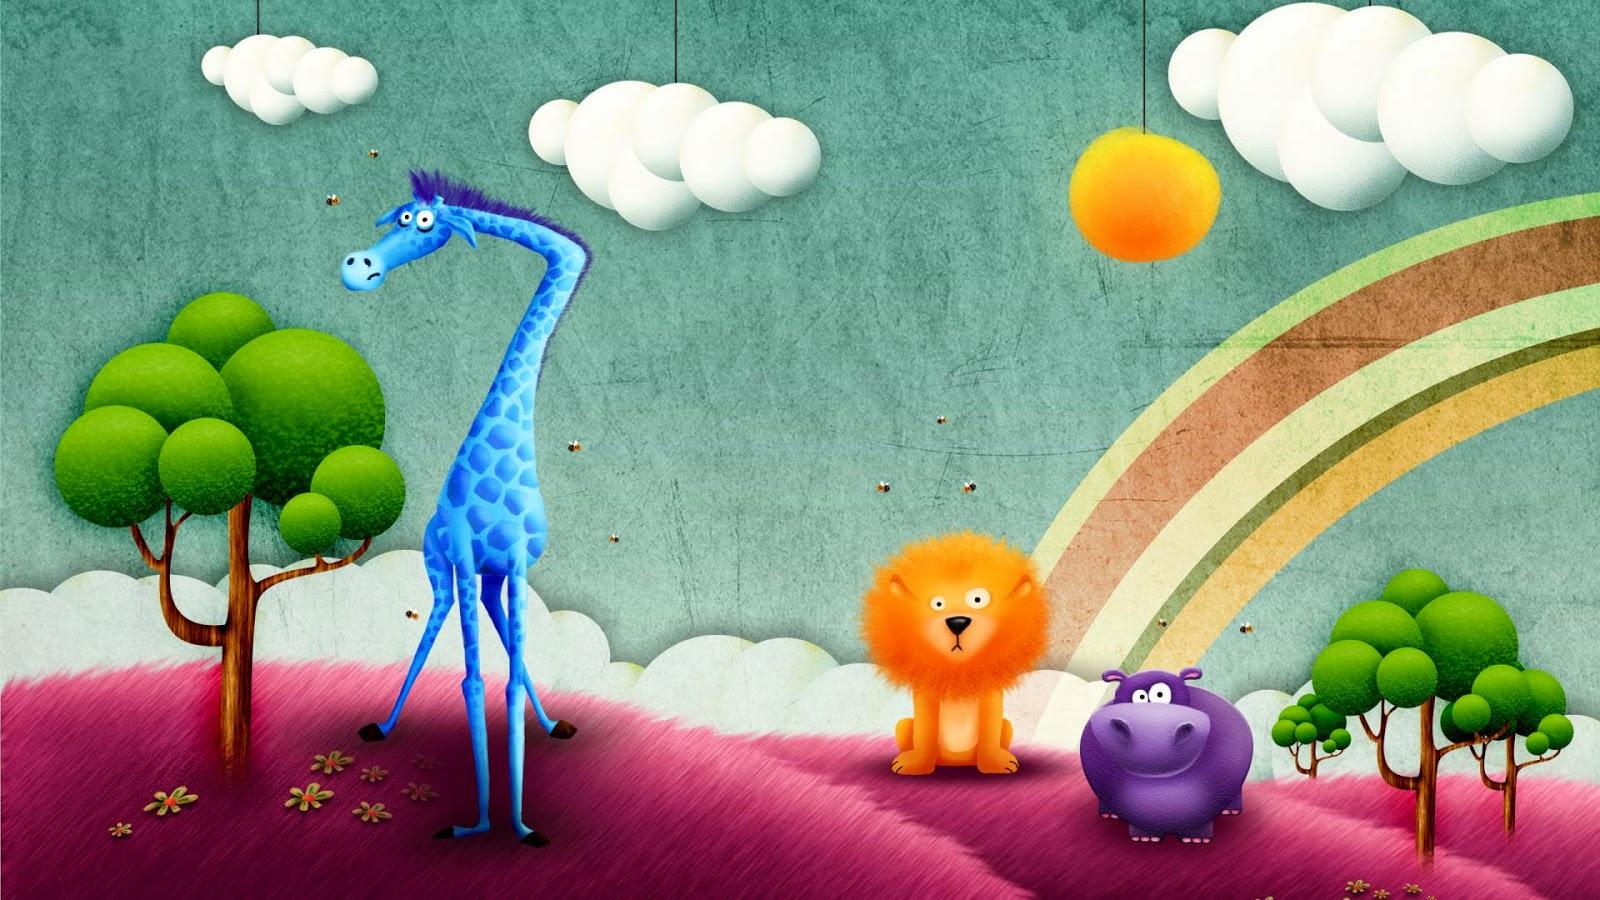 Abstract Cartoon Forest hd wallpaper